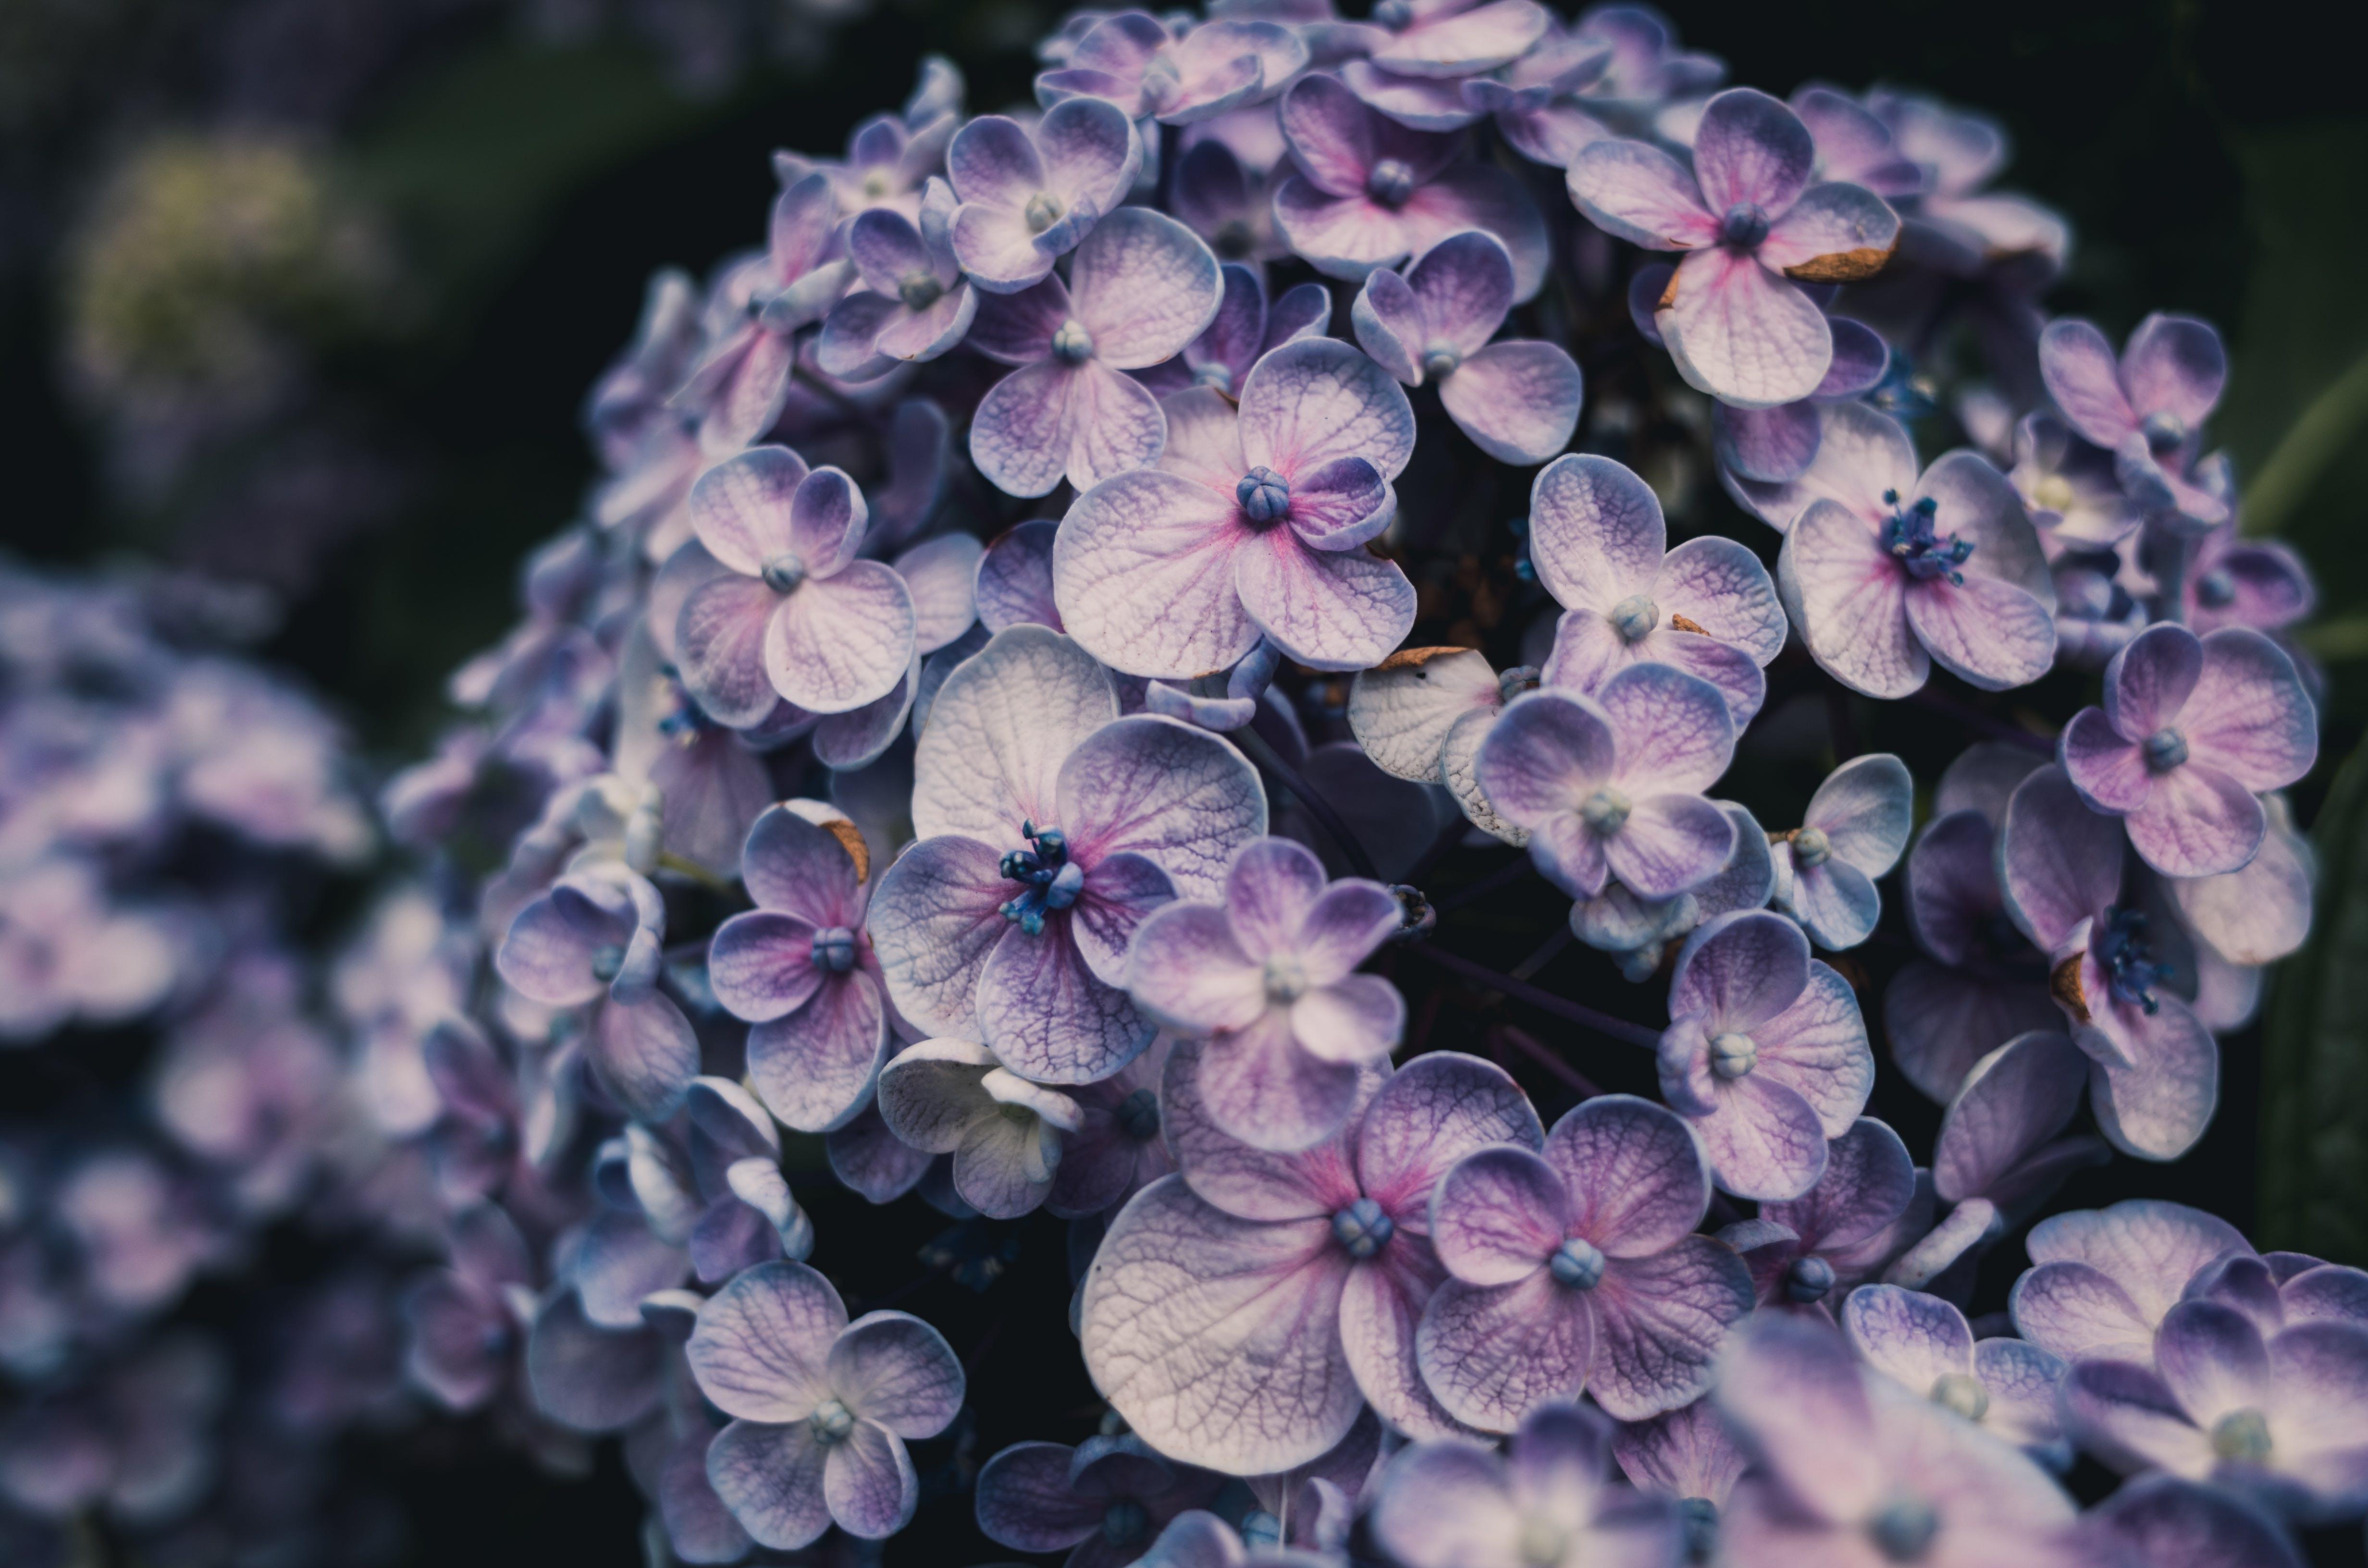 Close-Up Photo of Purple Hydrangea Flowers